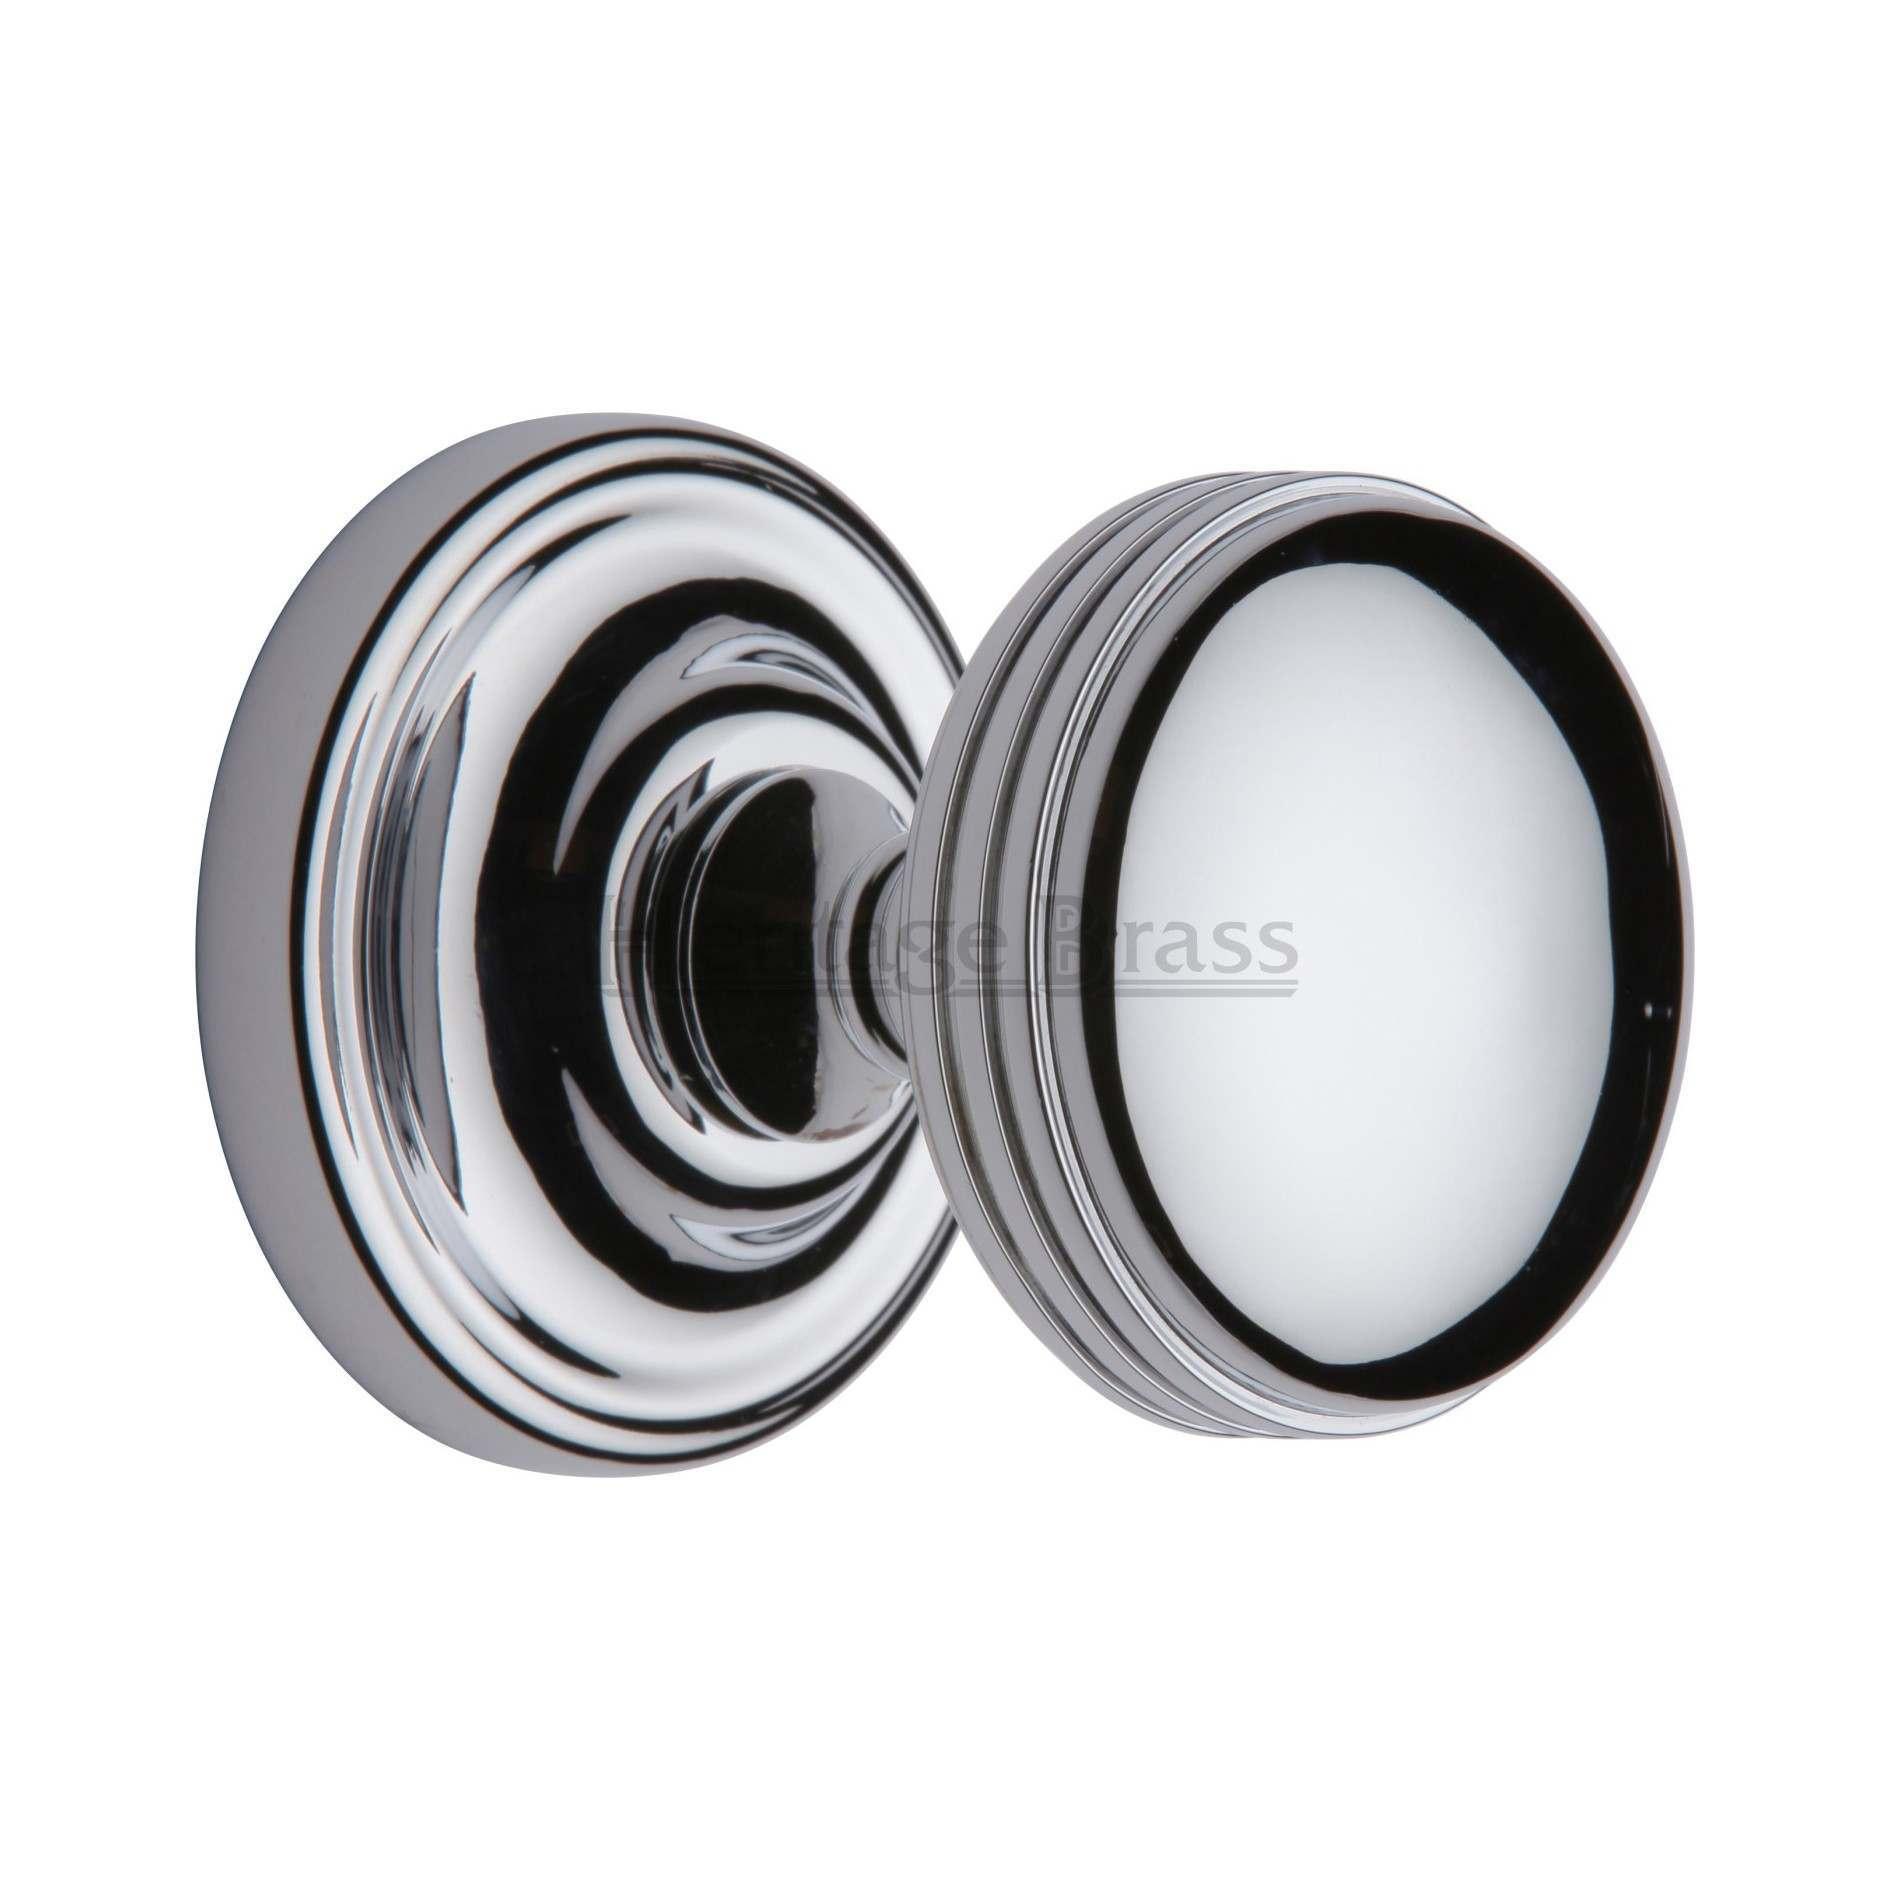 polished chrome door knob photo - 11